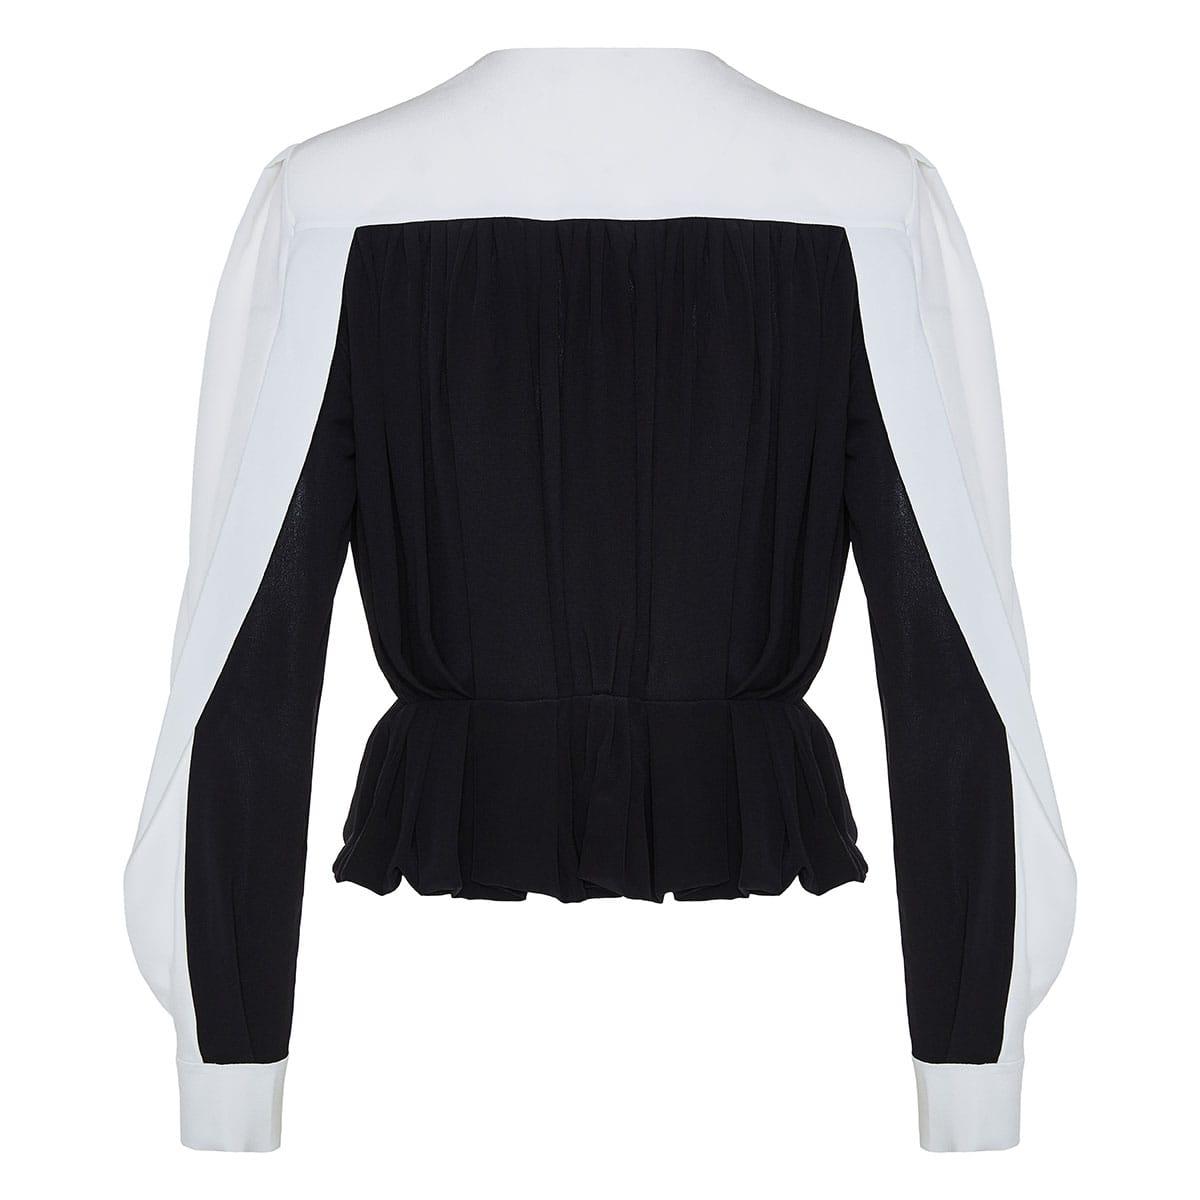 Two-tone pleated peplum blouse